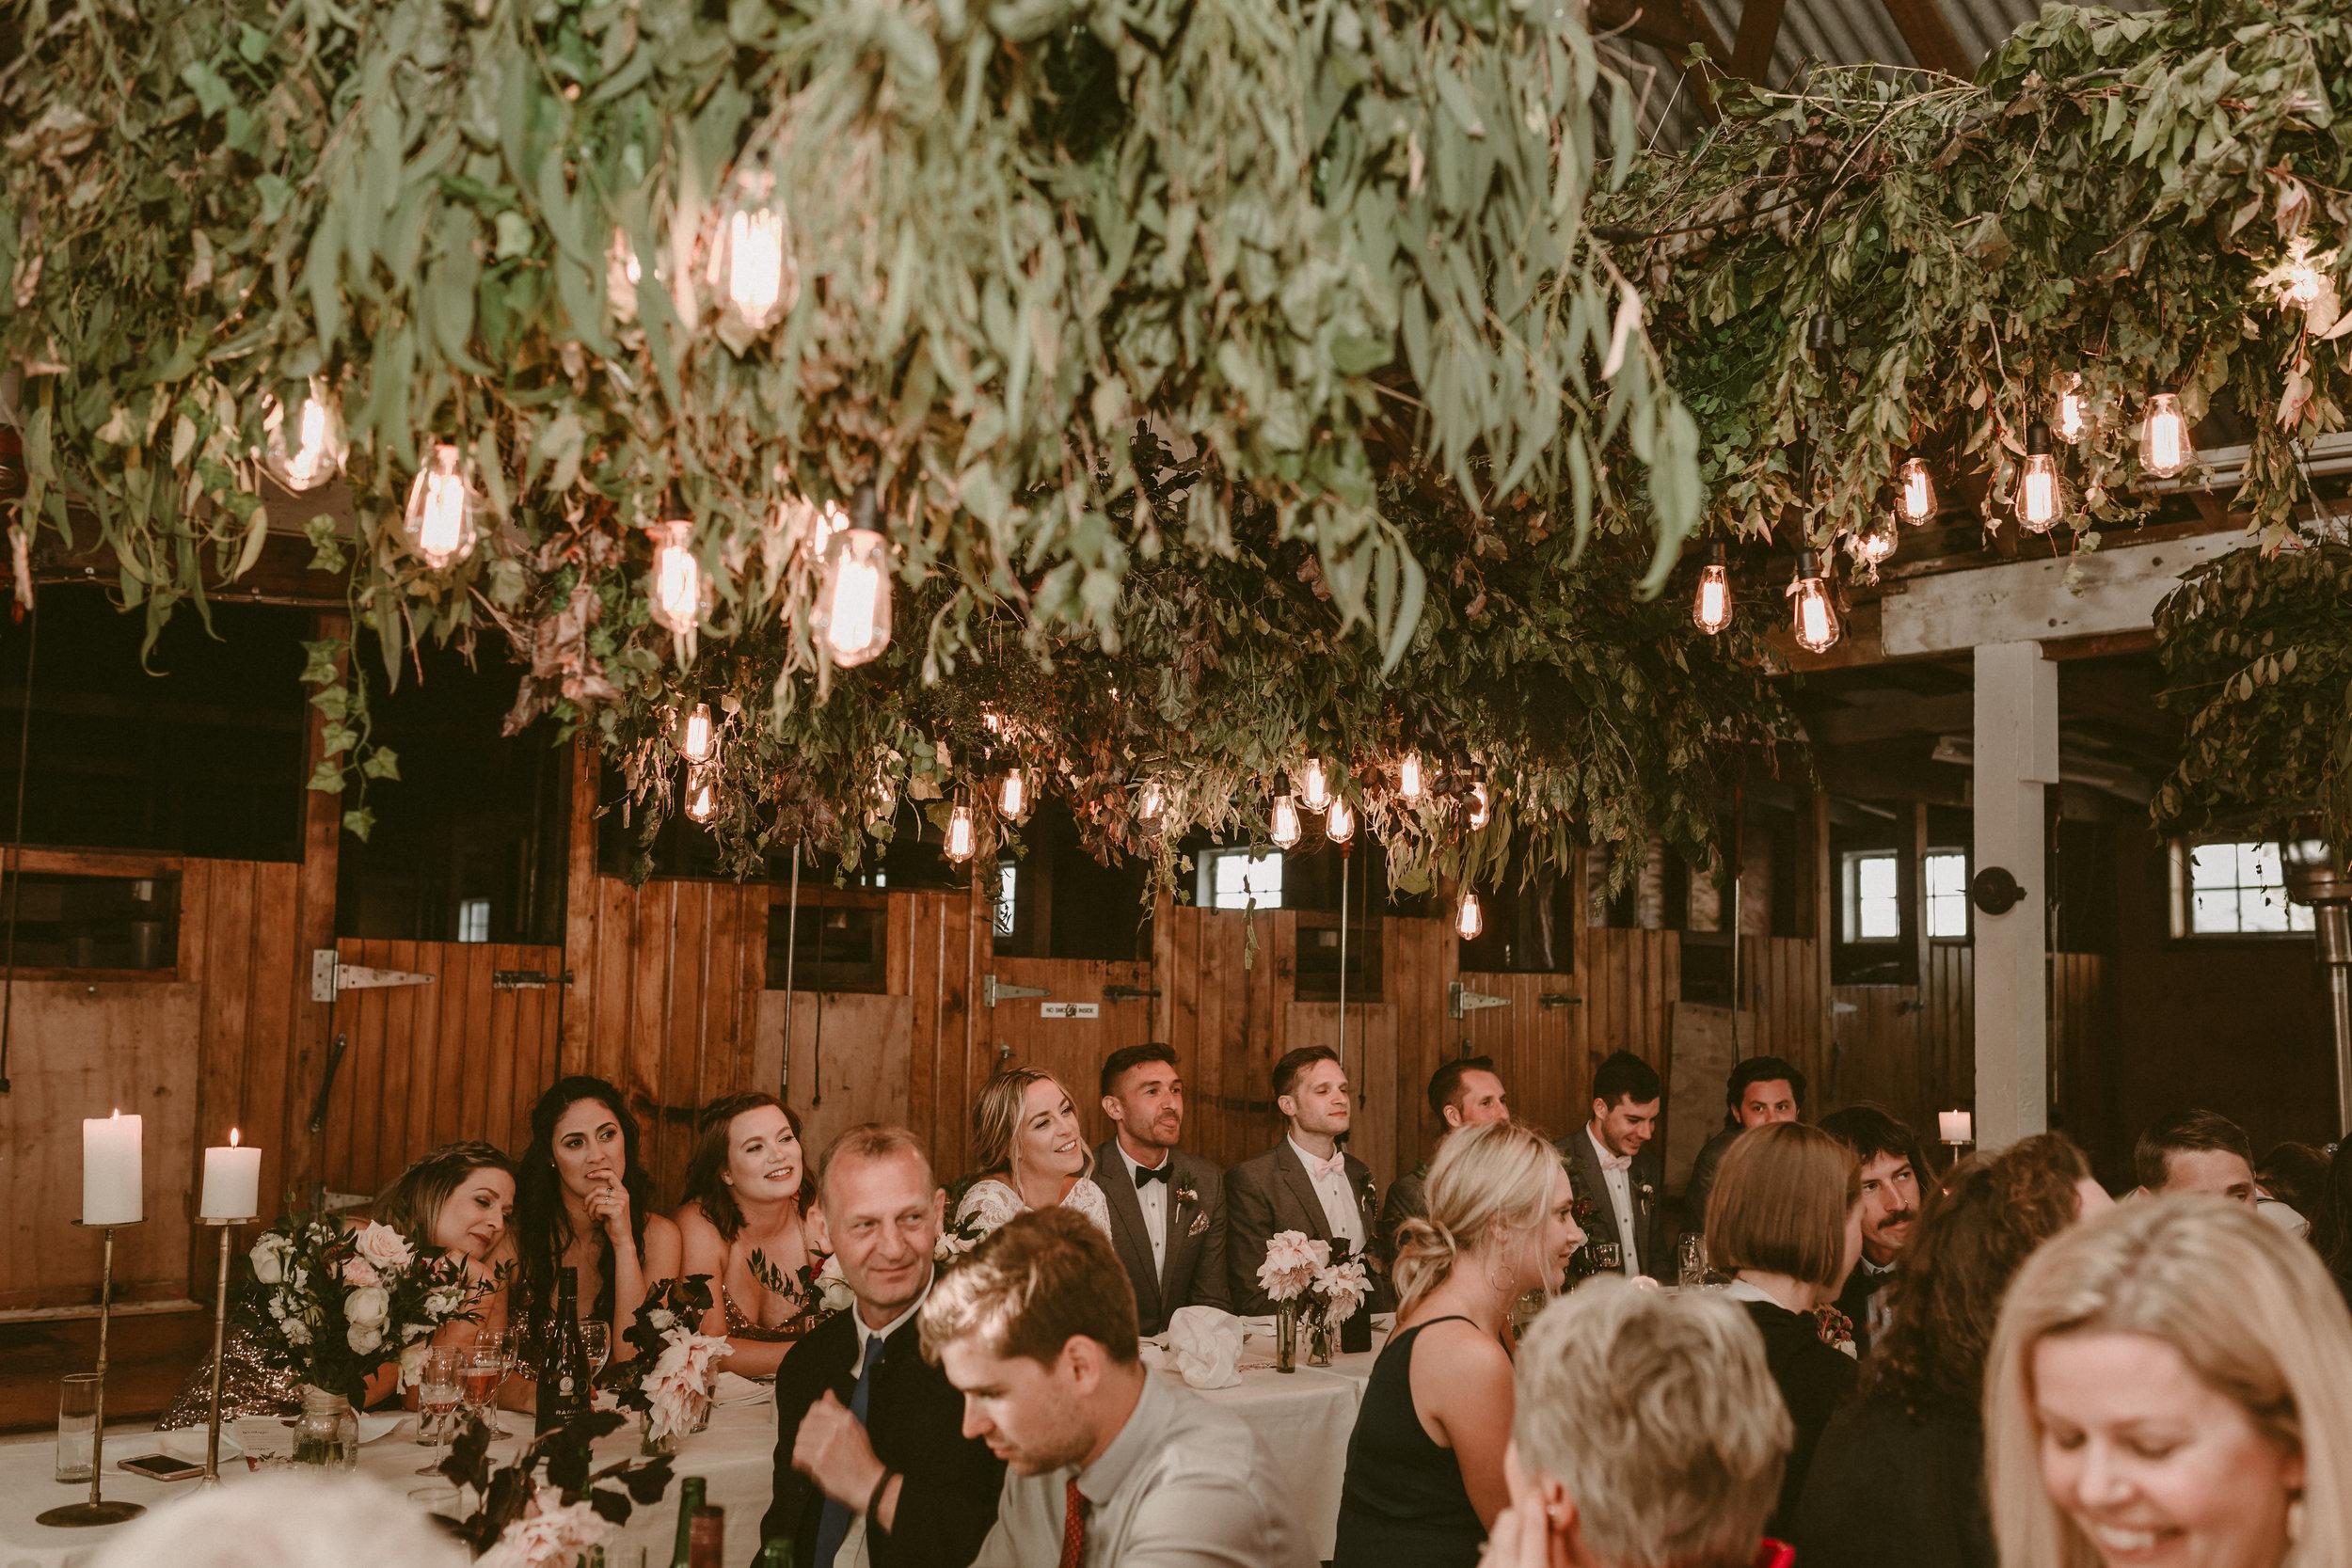 emiily_gary_mt_nic_wedding-611.jpg